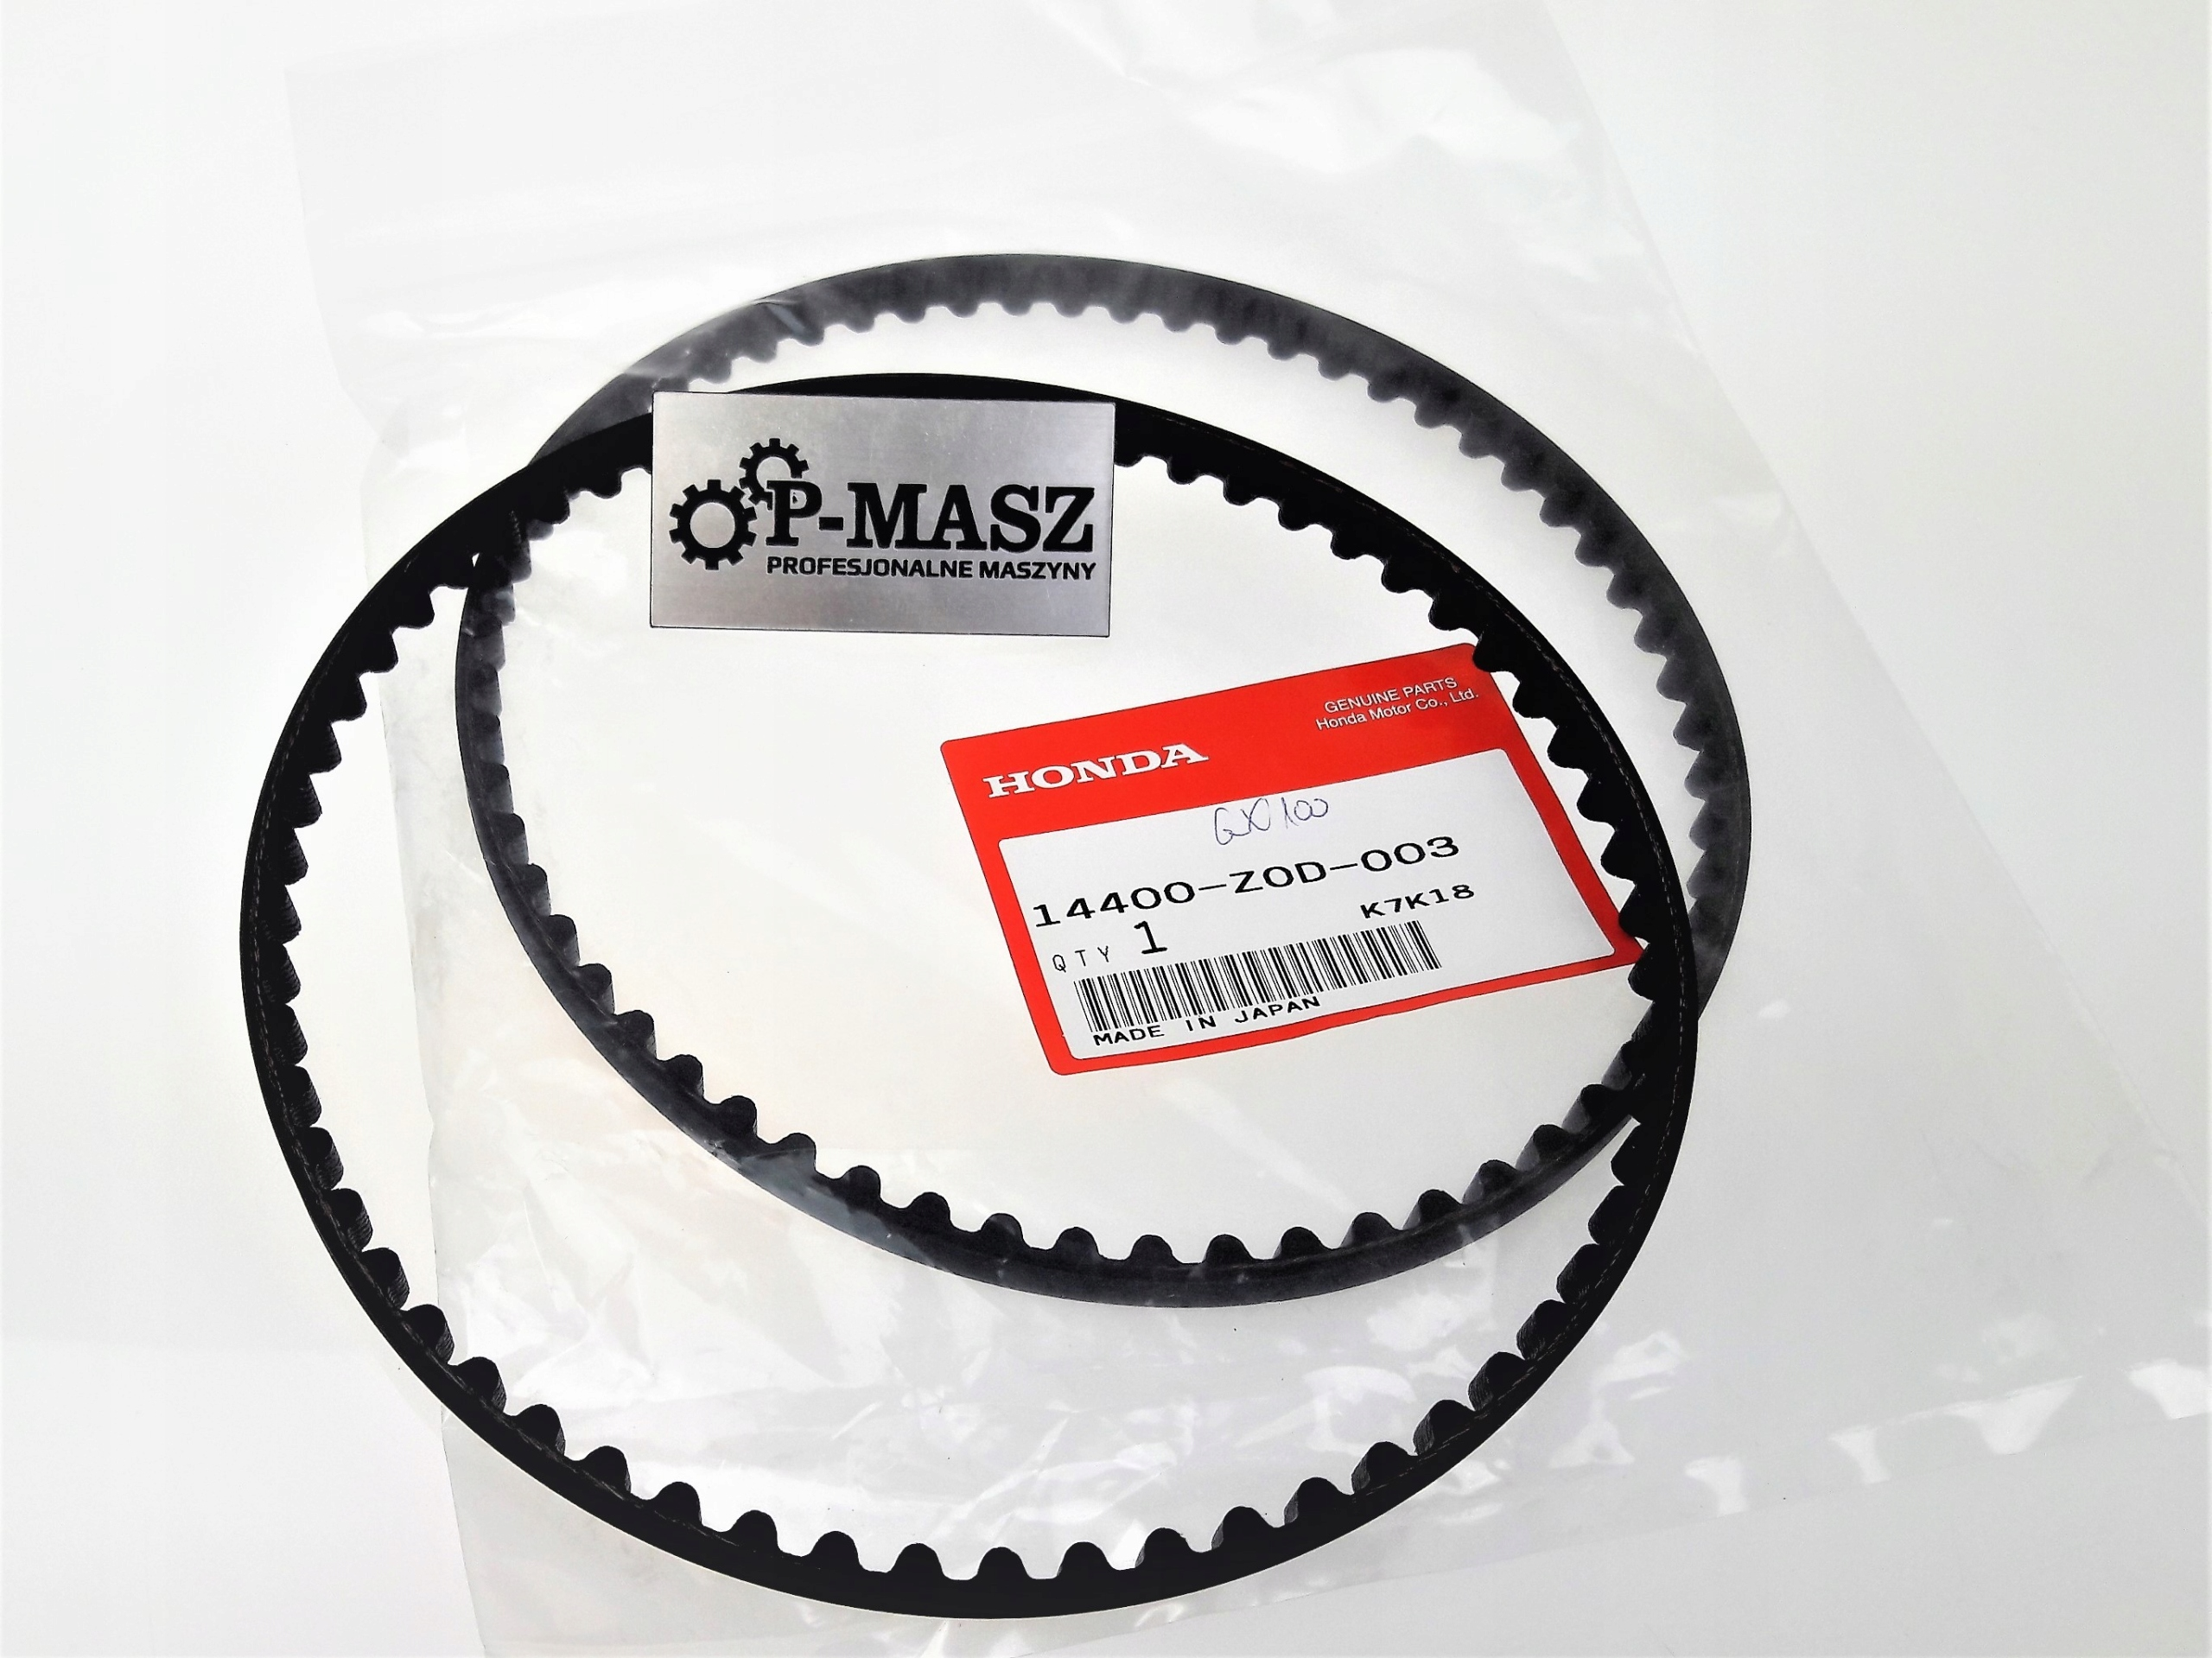 Ремень ГРМ Honda GX 100 14400-Z0D-003